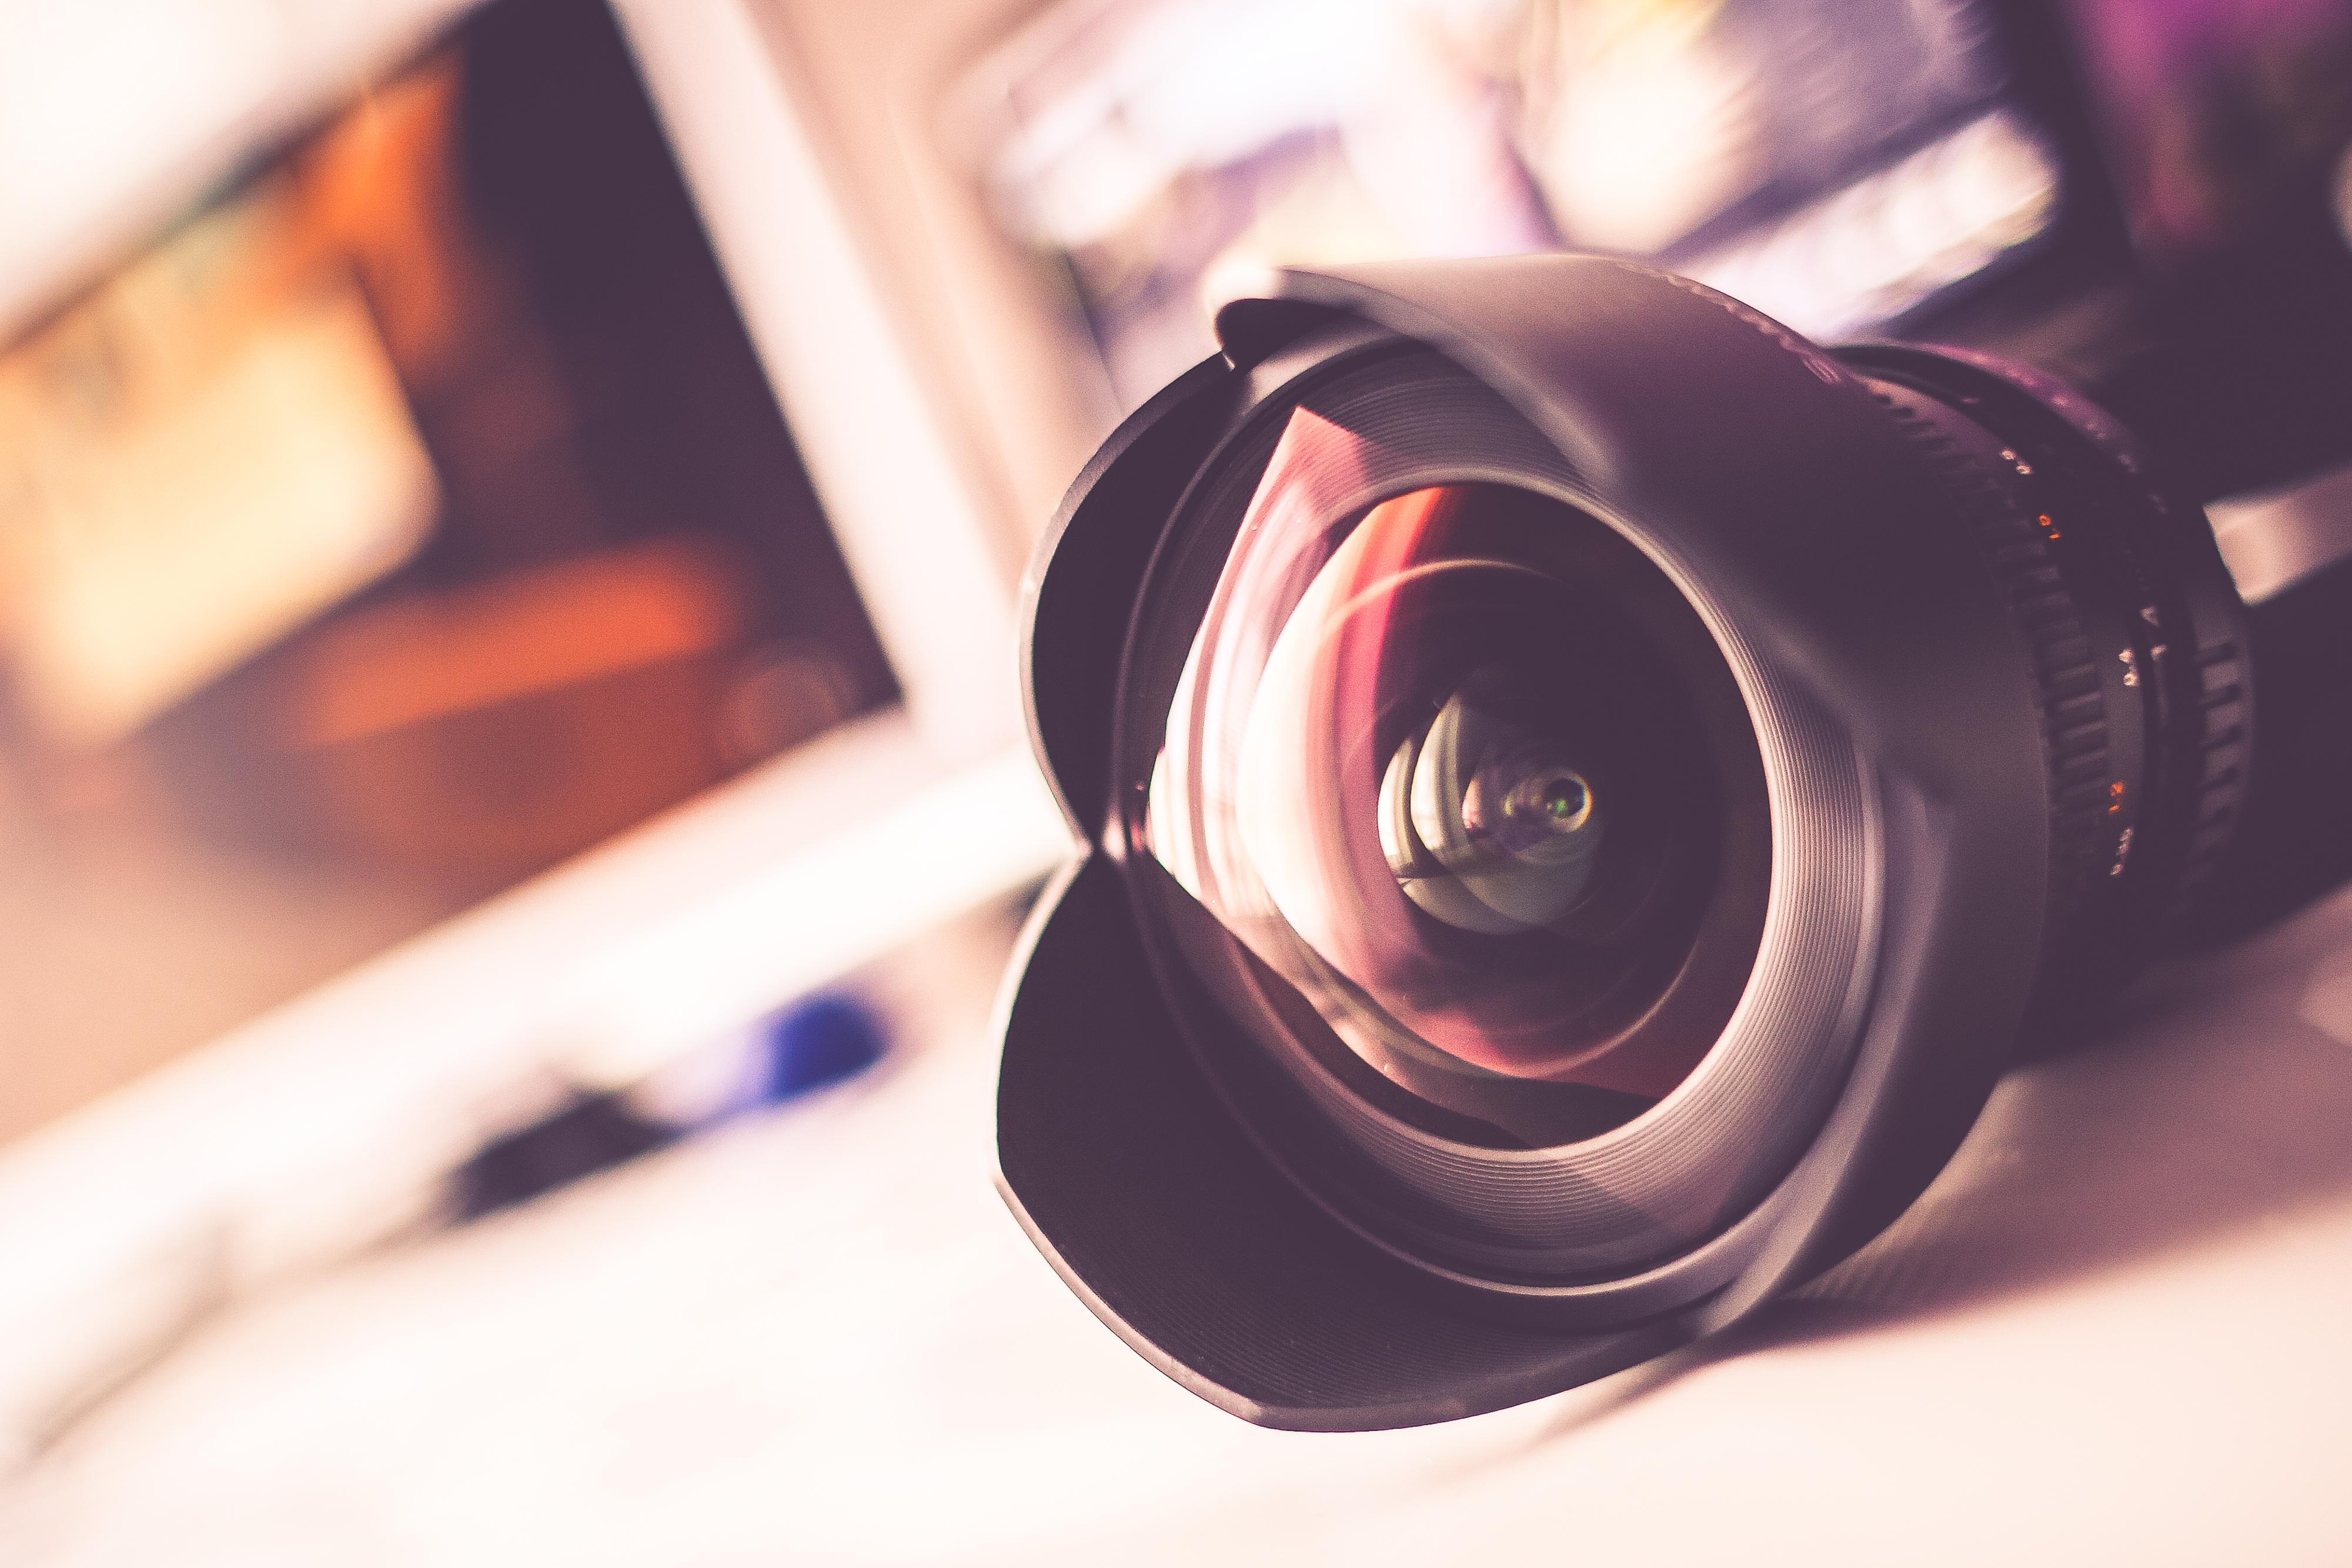 colorful-wide-angle-lenses-picjumbo-com